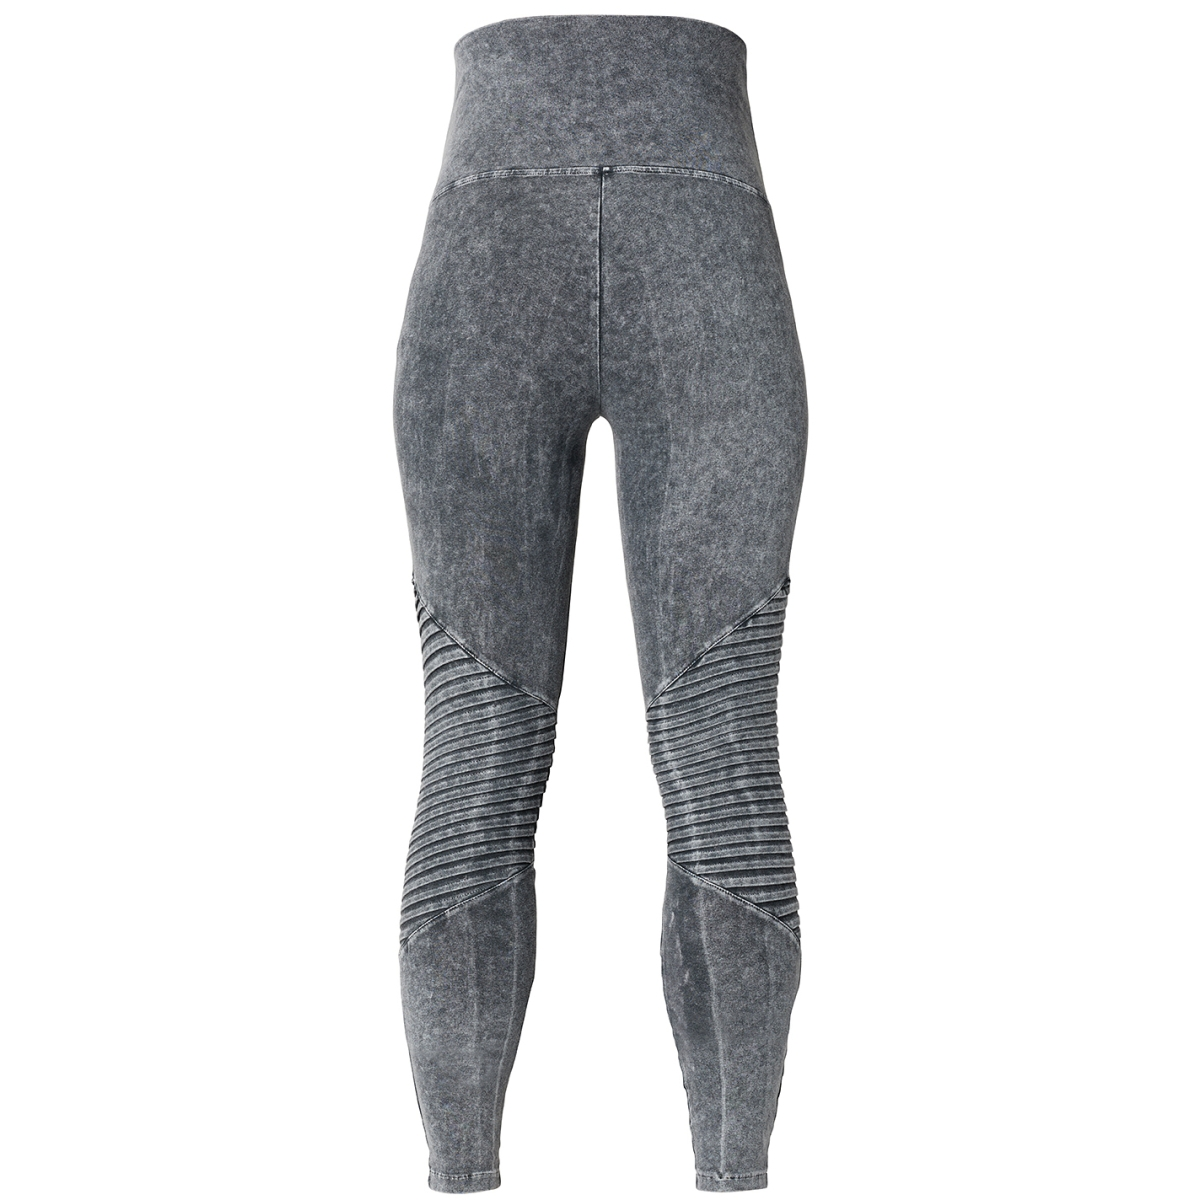 s0568 legging washed supermom positie broek black